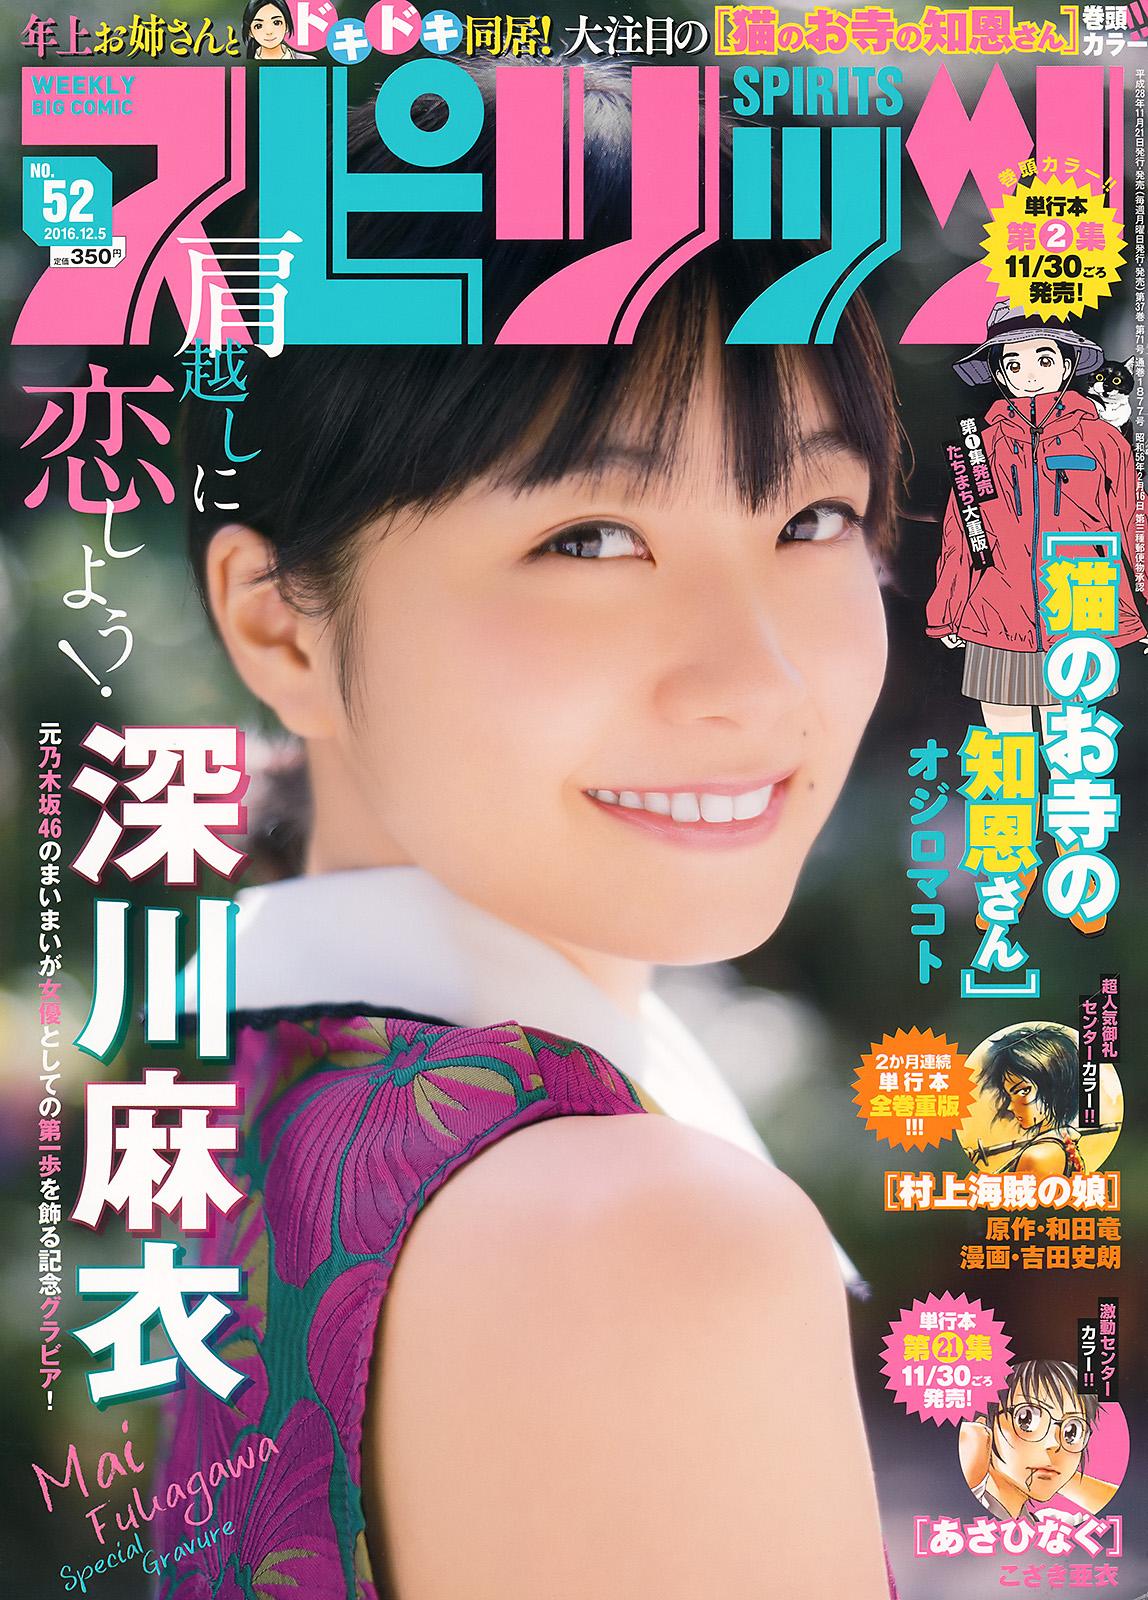 Fukagawa Mai 深川麻衣 Nogizaka46, Big Comic Spirits 2016.12.05 No.52 (週刊スピリッツ 2016年52号)